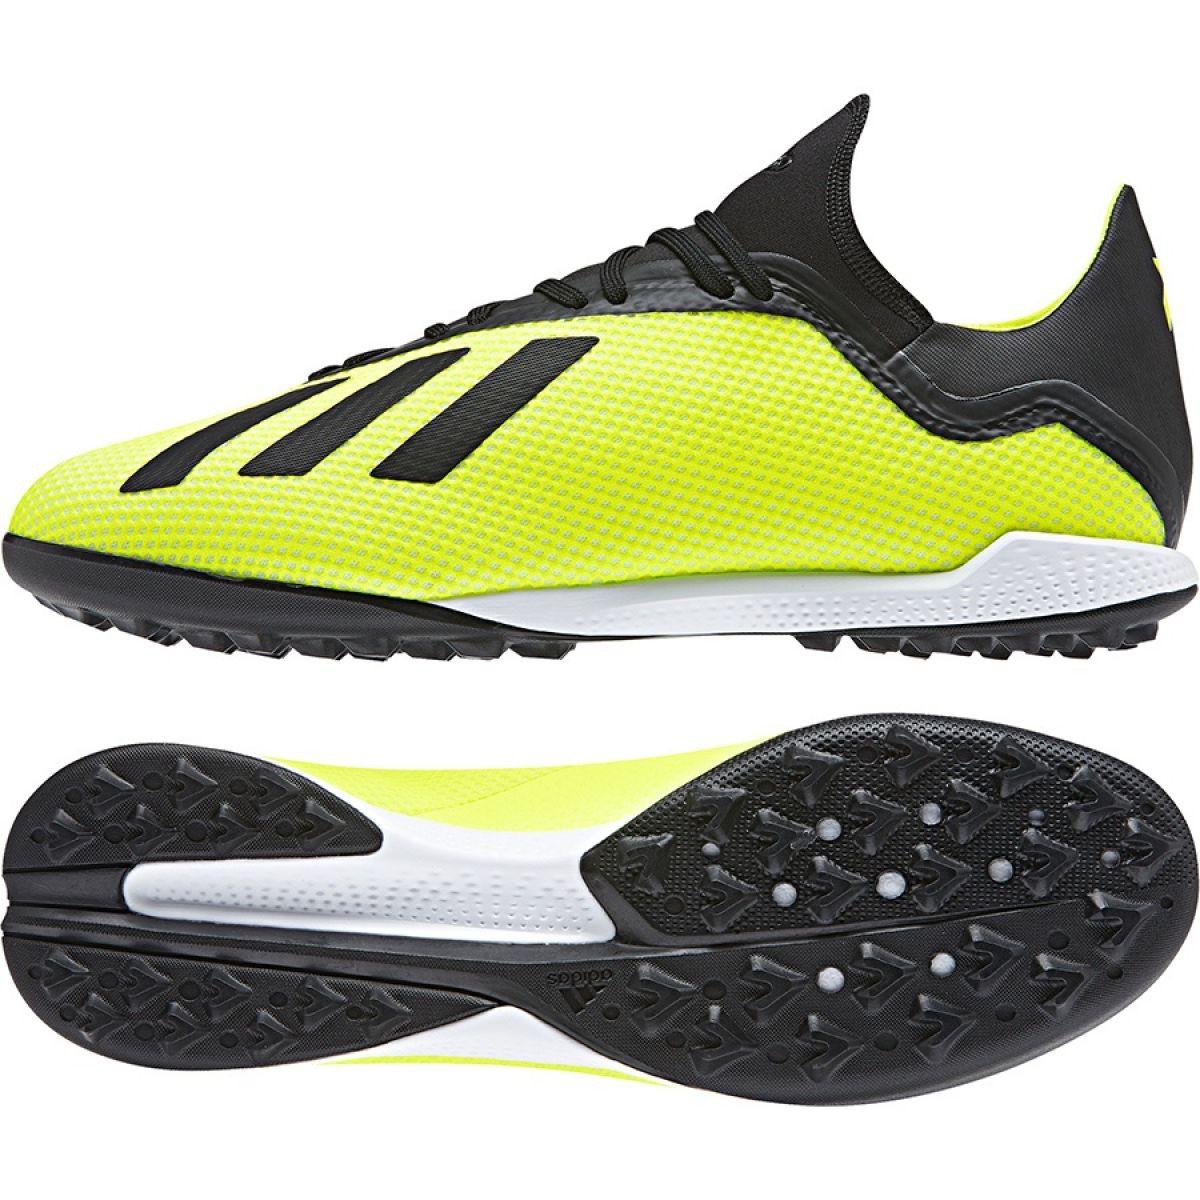 Chuteira Esportiva Adidas Conforto | Shoes4you